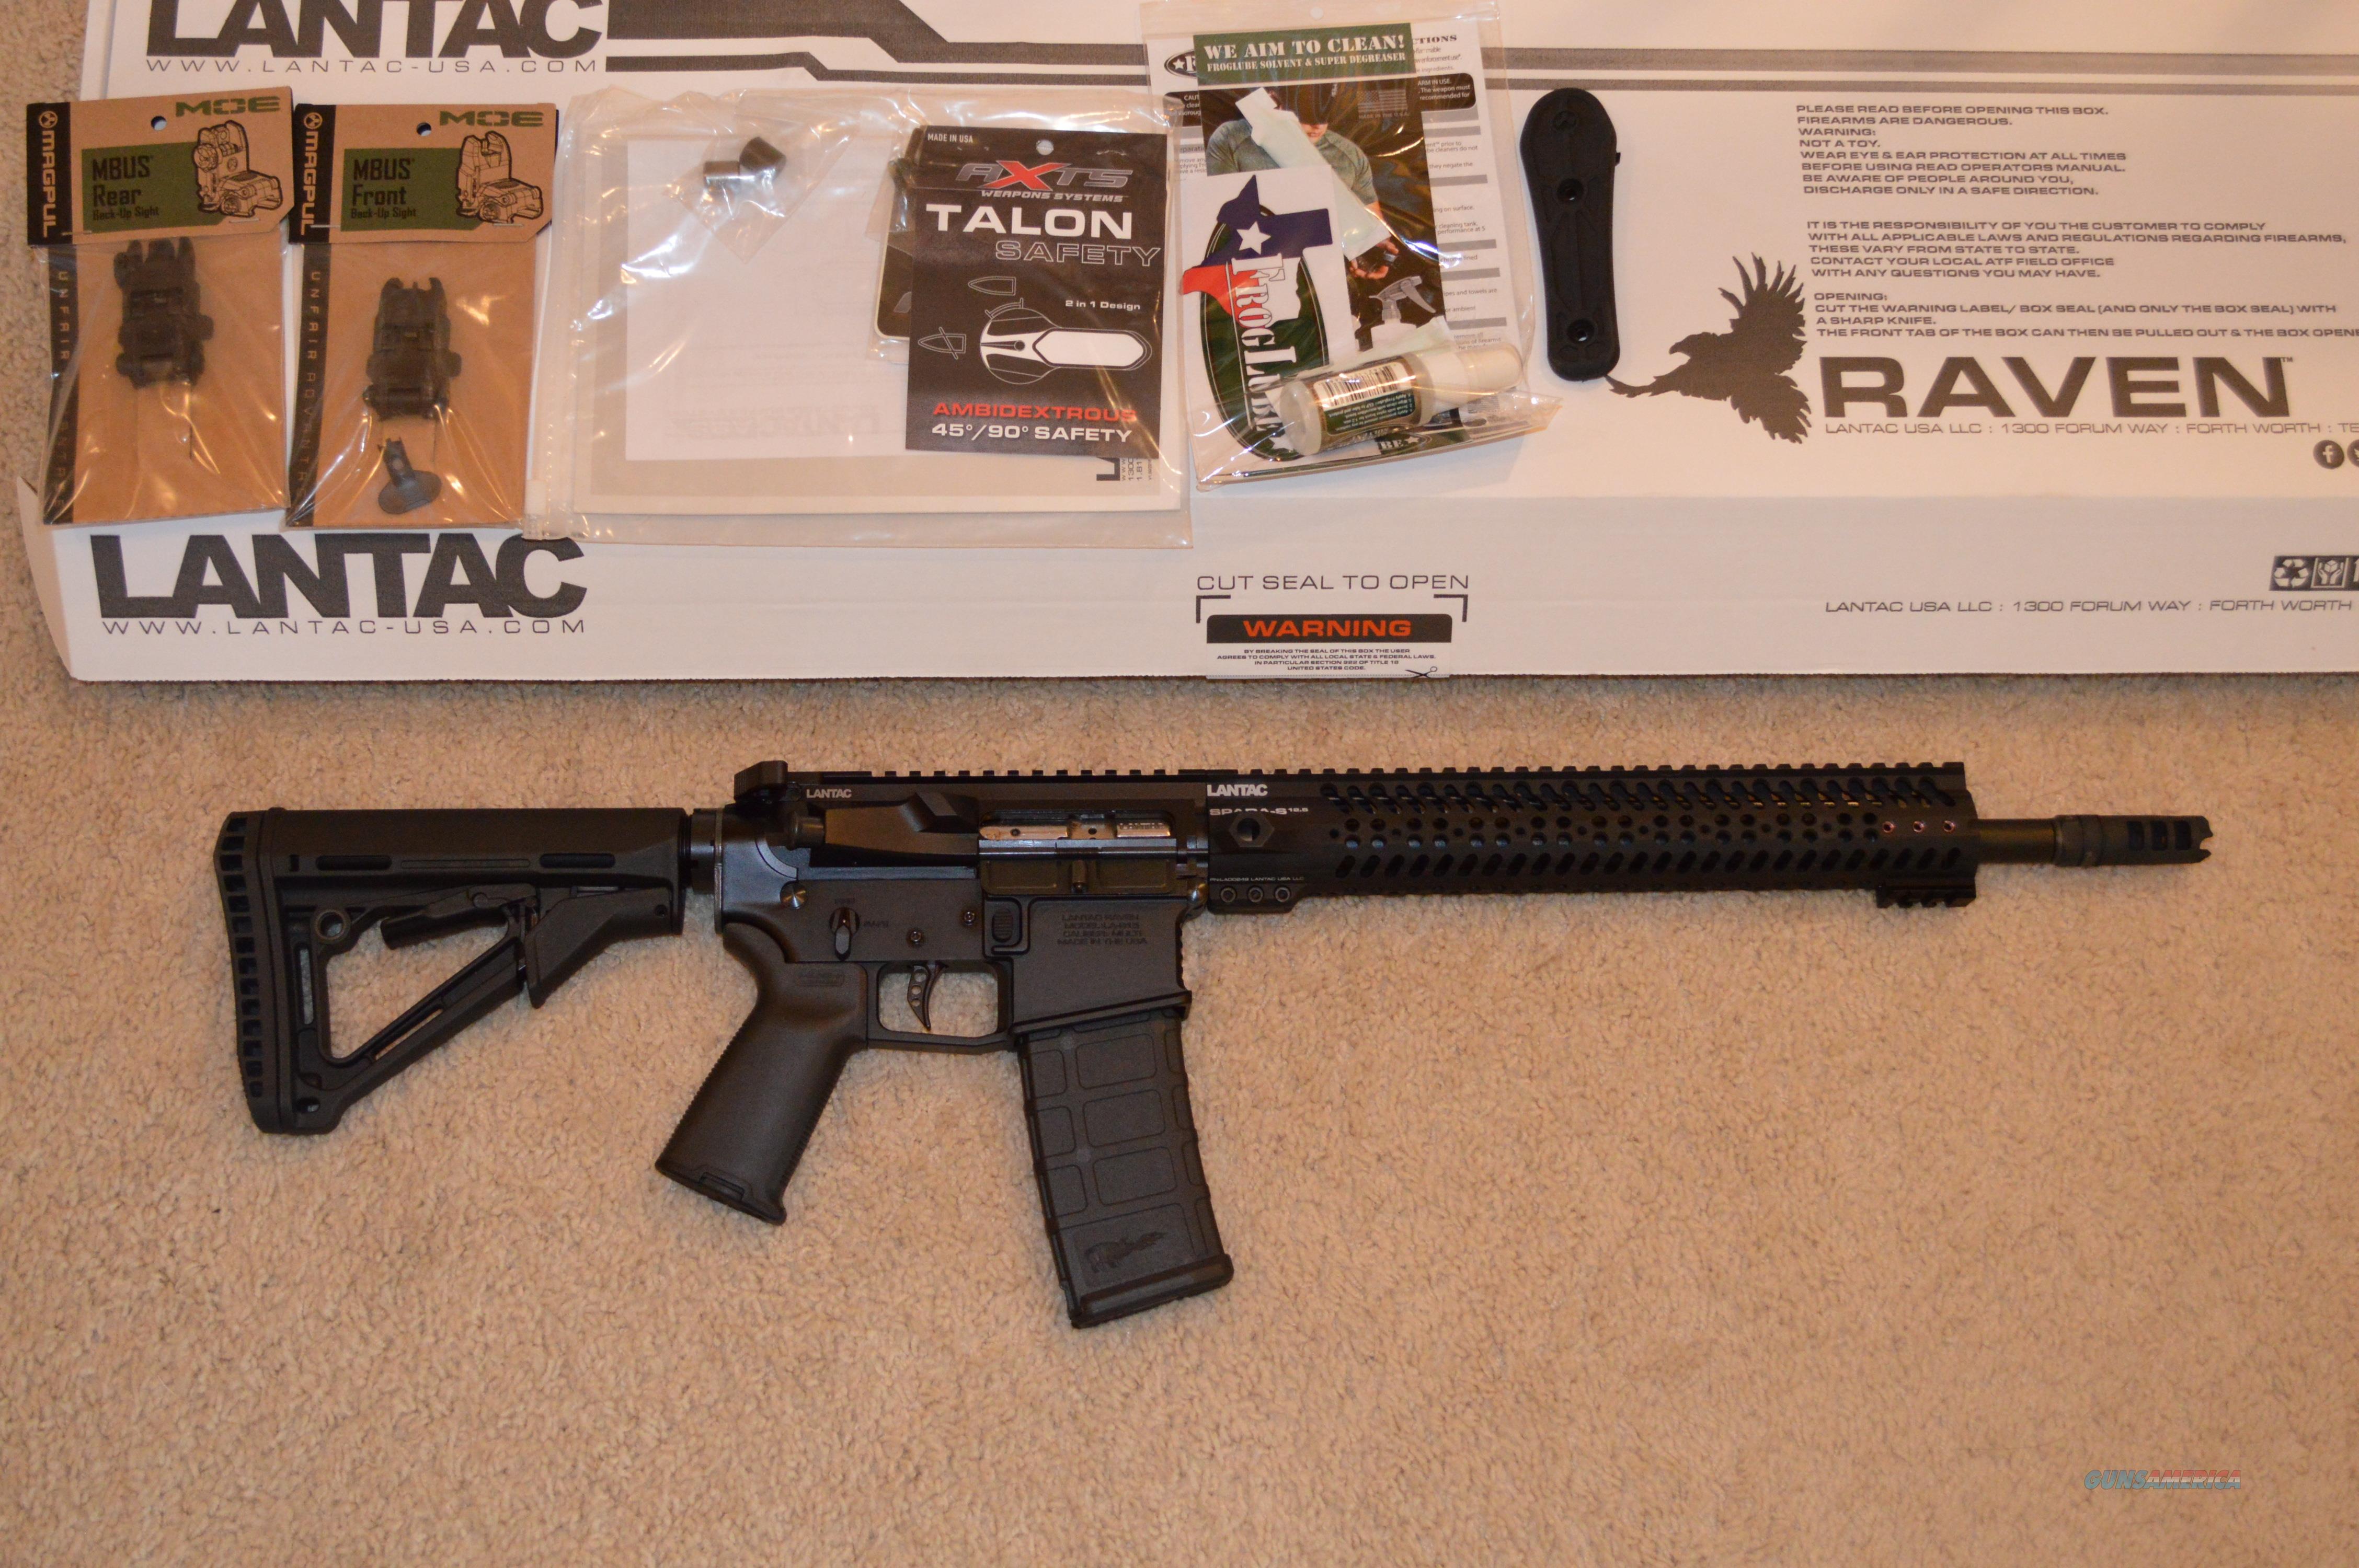 Lantac Raven LA-R15   Guns > Rifles > AR-15 Rifles - Small Manufacturers > Complete Rifle